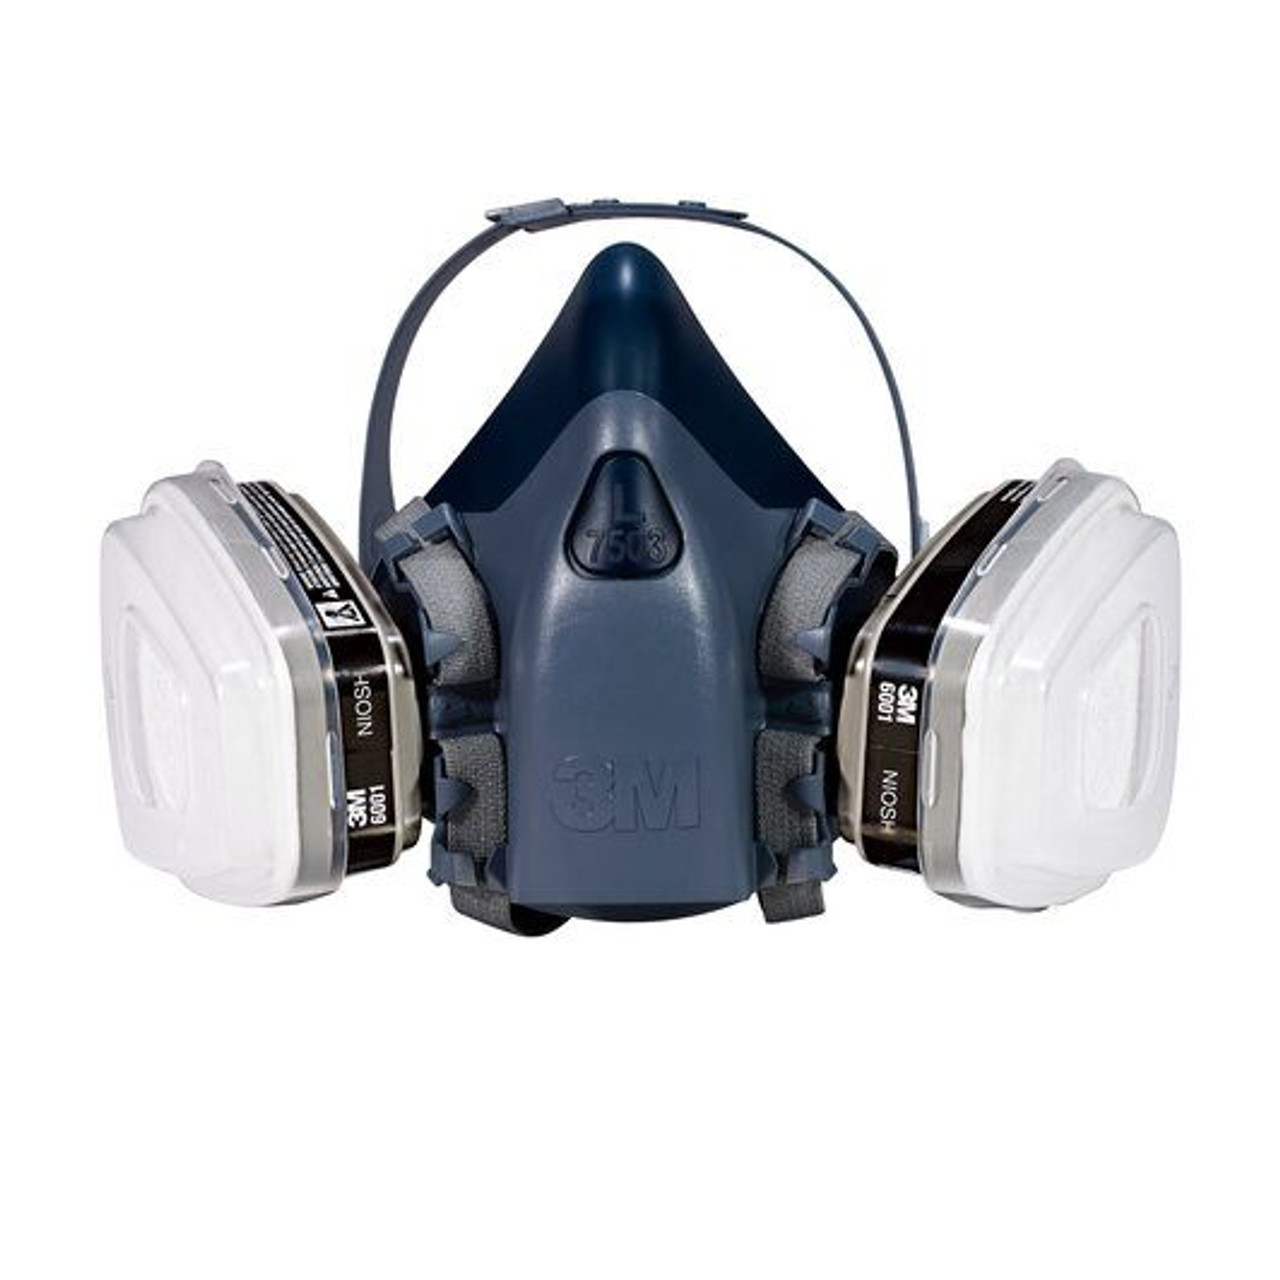 3m 7500 series half mask respirator